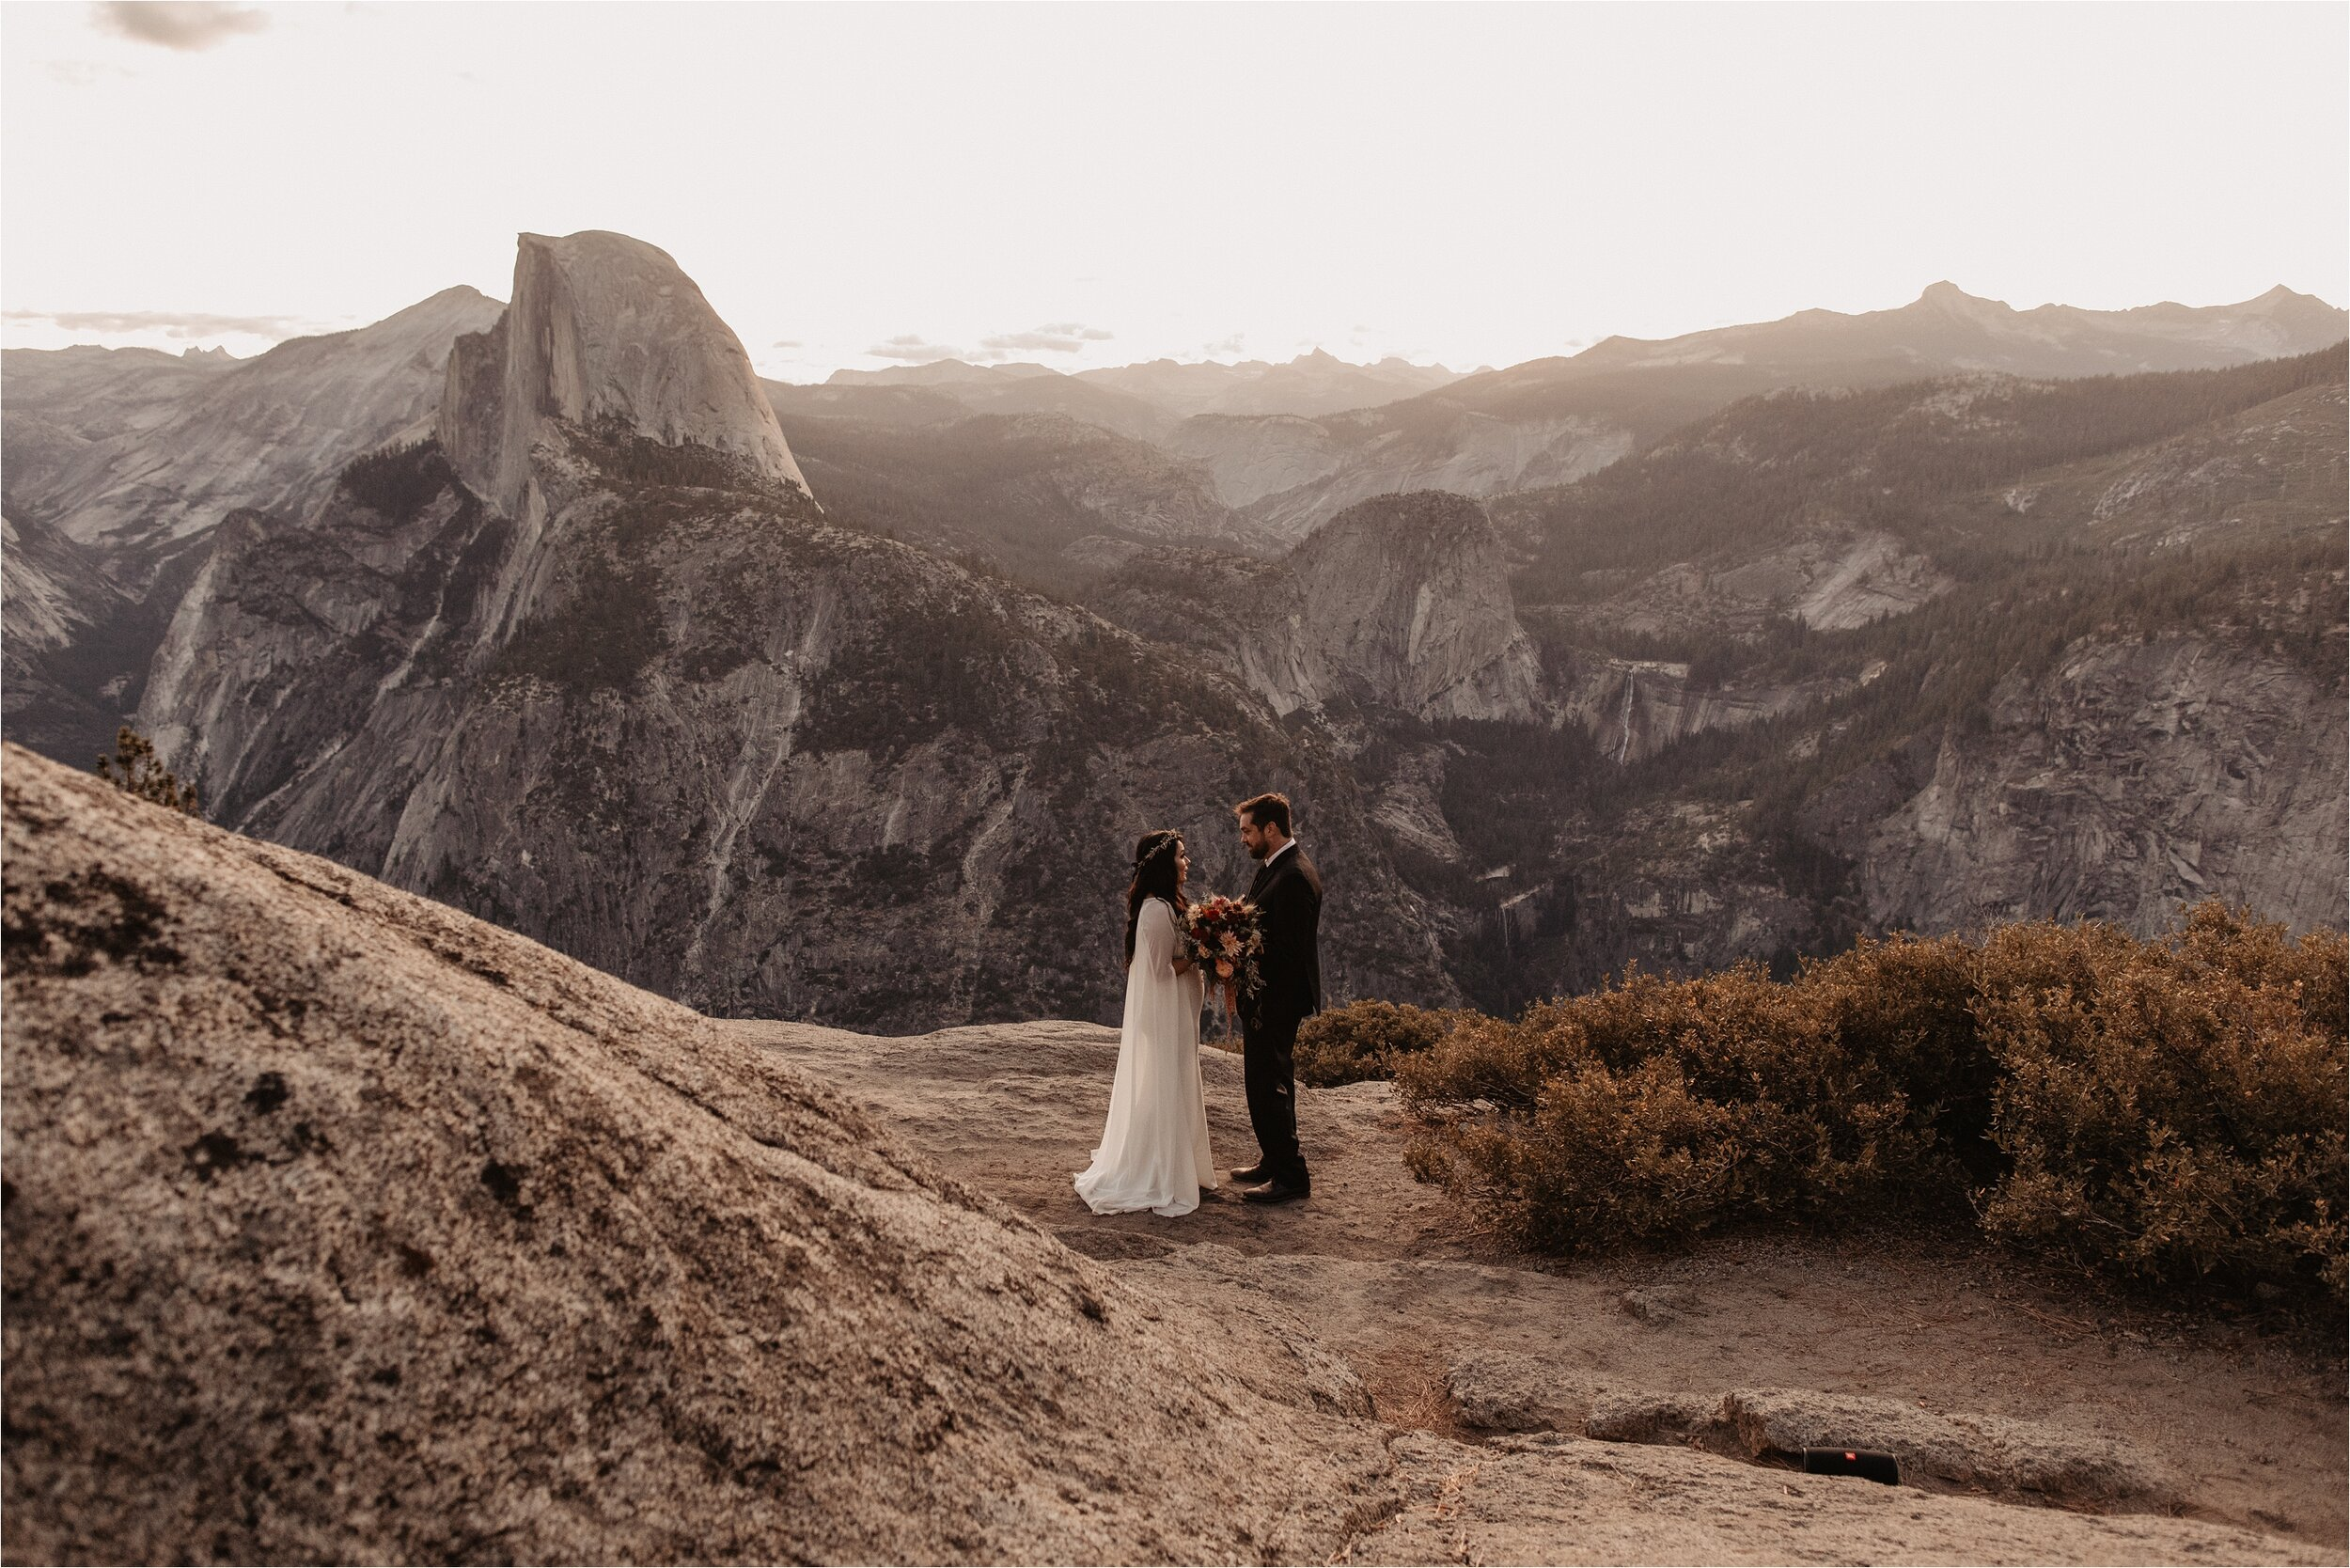 glacier-point-yosemite-elopement-ceremony_0001.jpg